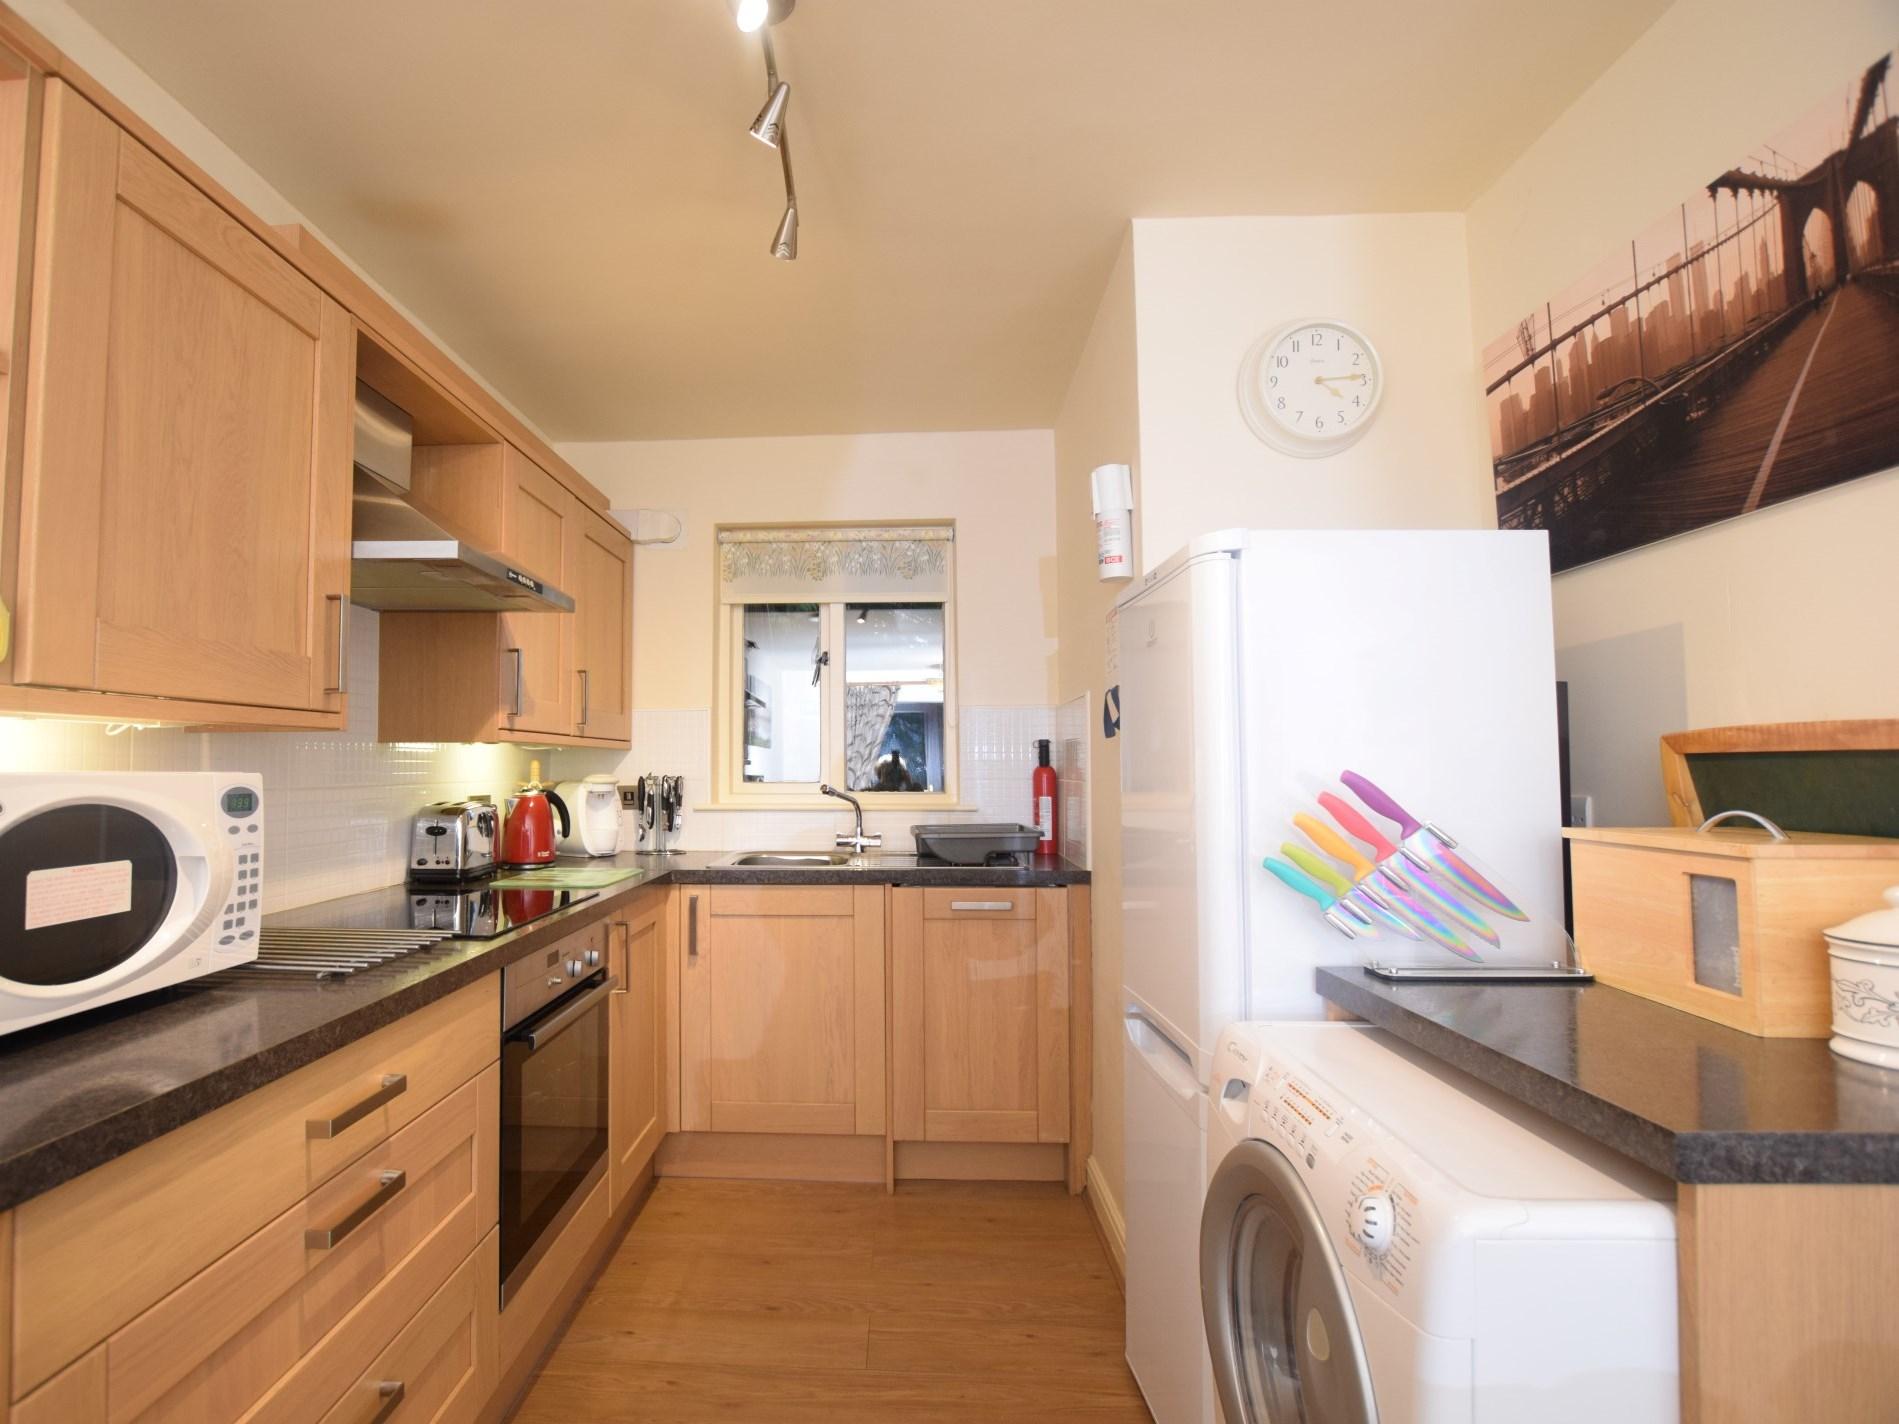 1 Bedroom Cottage in Ambleside, Scottish Borders